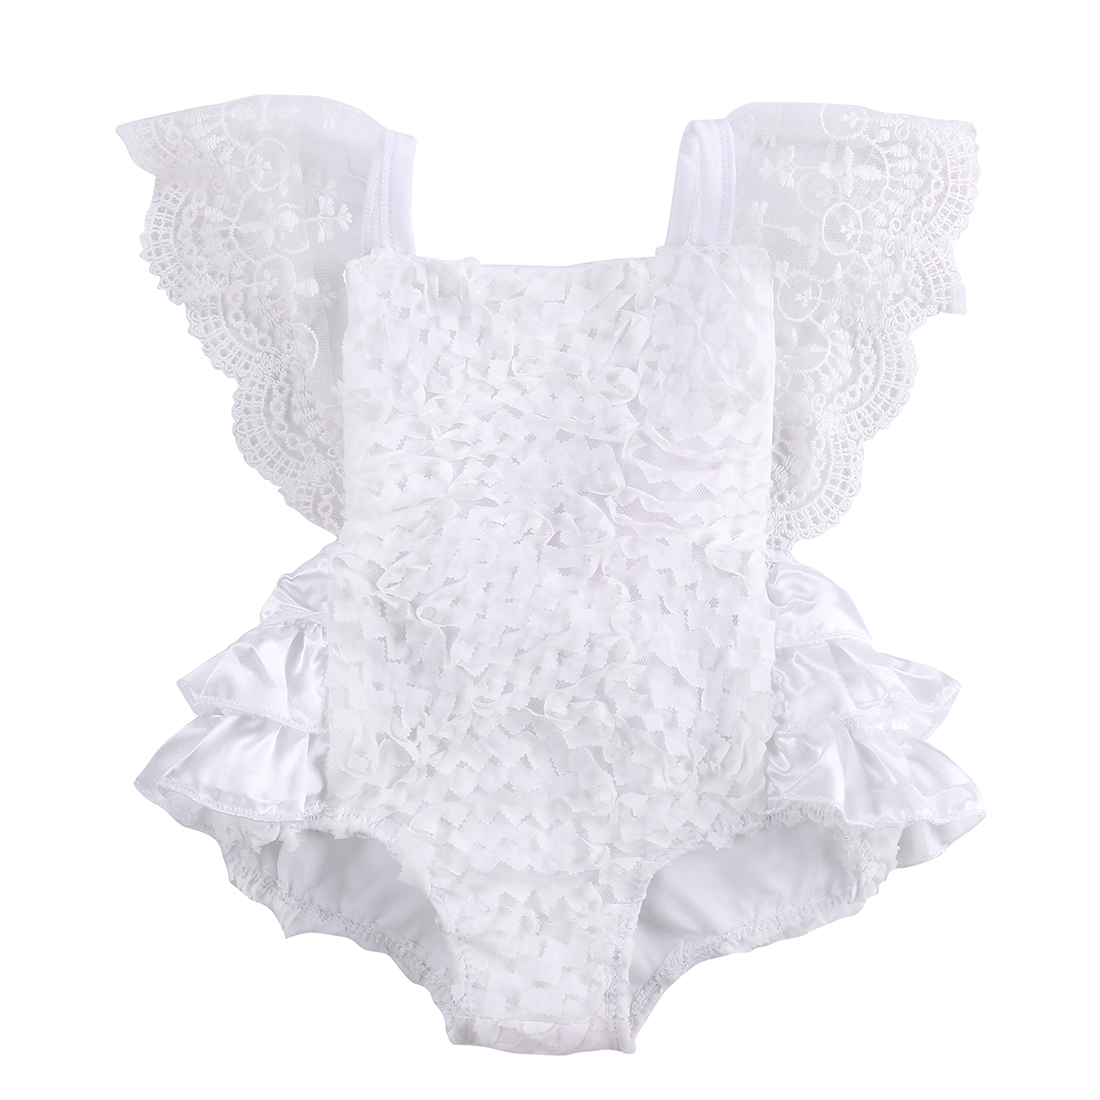 2016 Fashion Baby Bodysuit Wholesale Kids Baby Girls